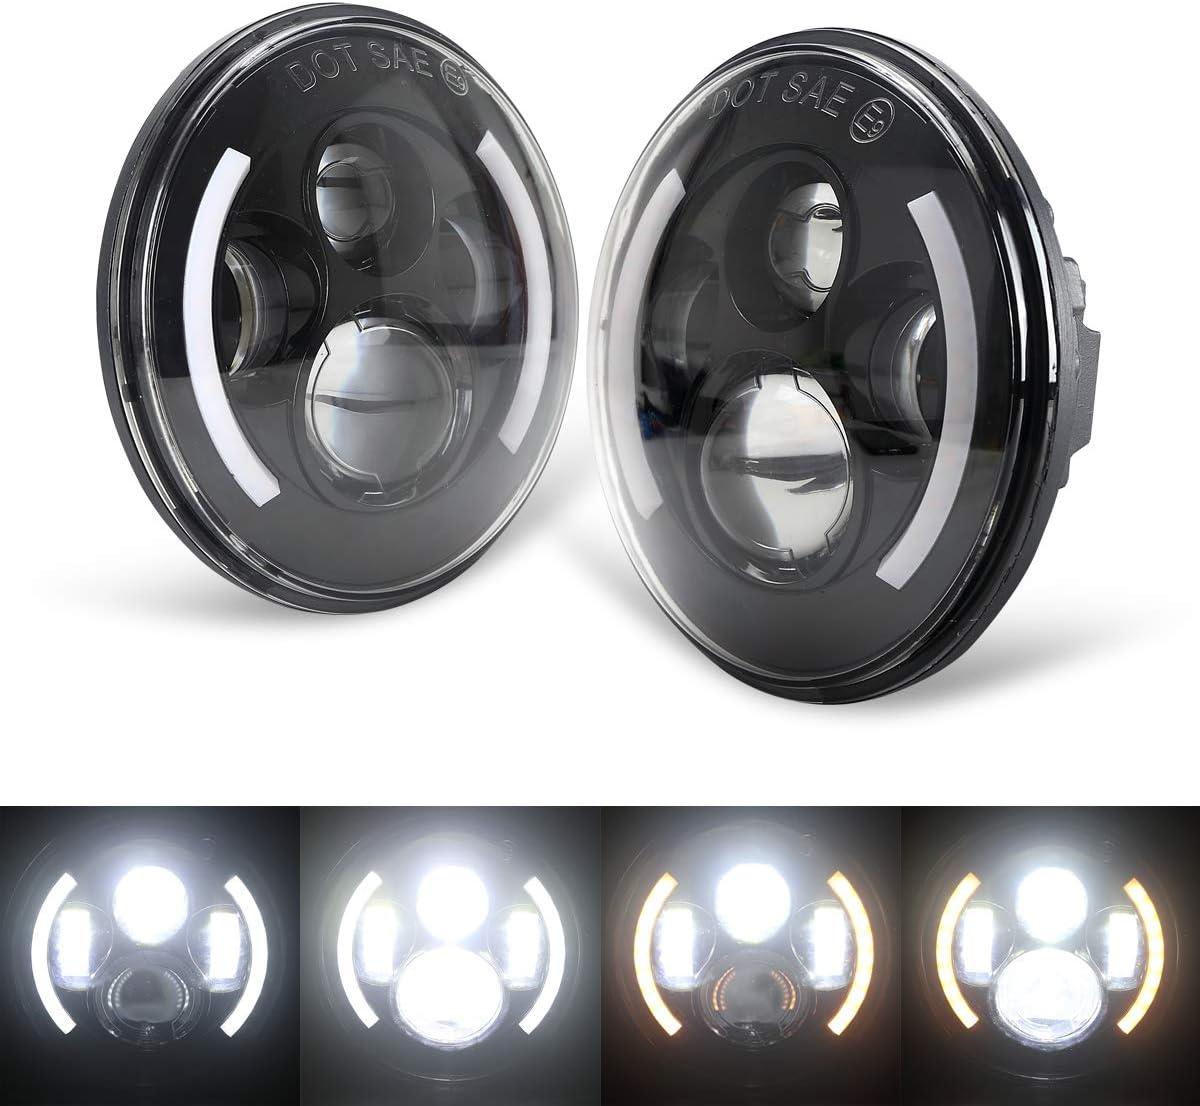 Green-L 7inch Cree LED Phare Pour Projecteur Harley Davidson Daymaker Ronde Ampoule Led Angel Eye Drl Halo Noir-2pcs